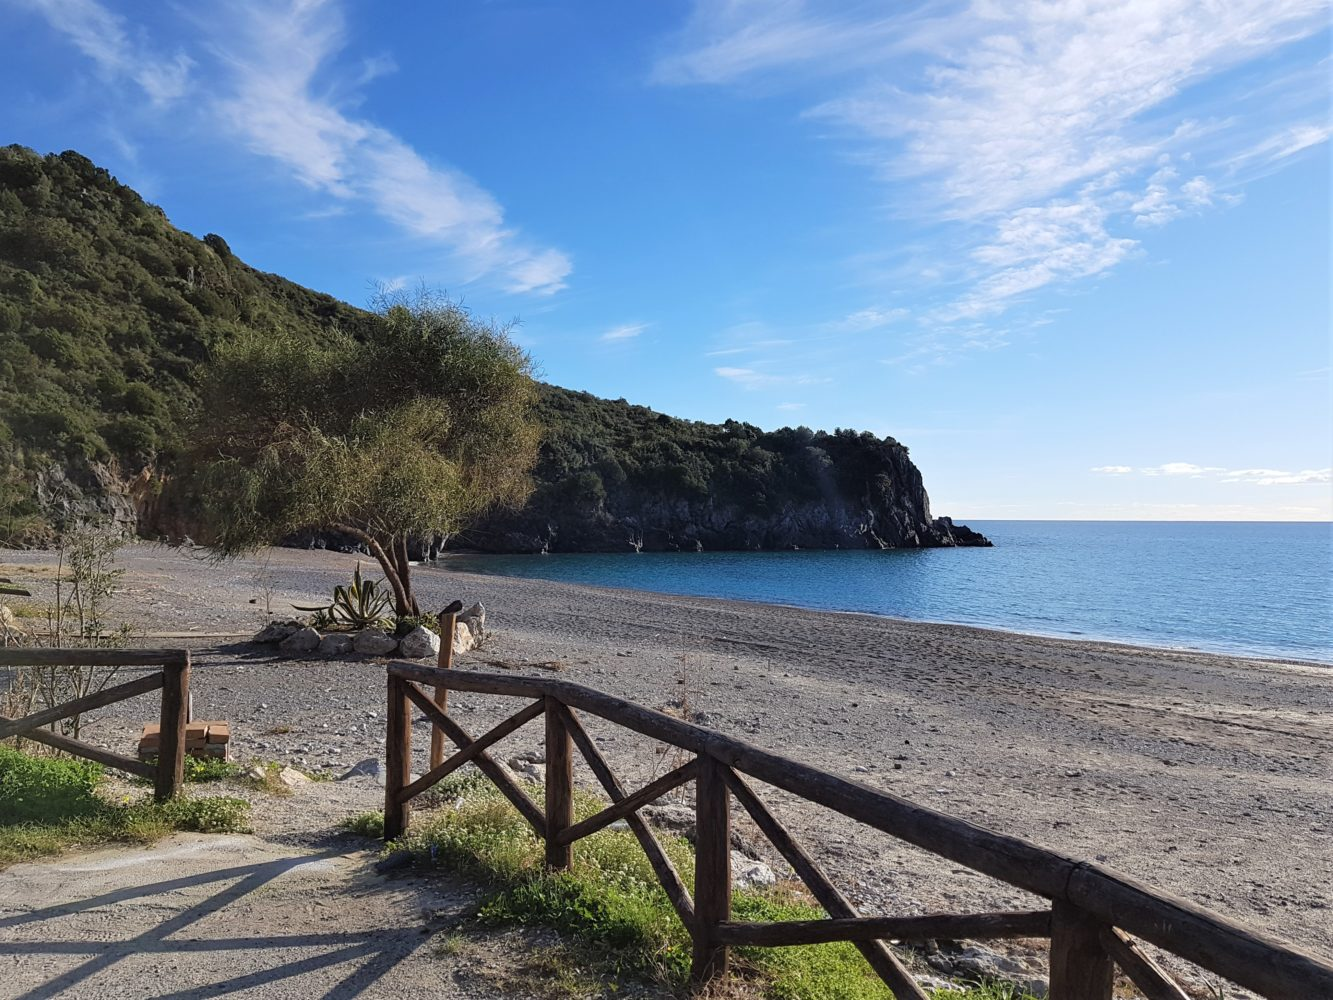 Spiaggia di Lentiscelle a Marina di camerota